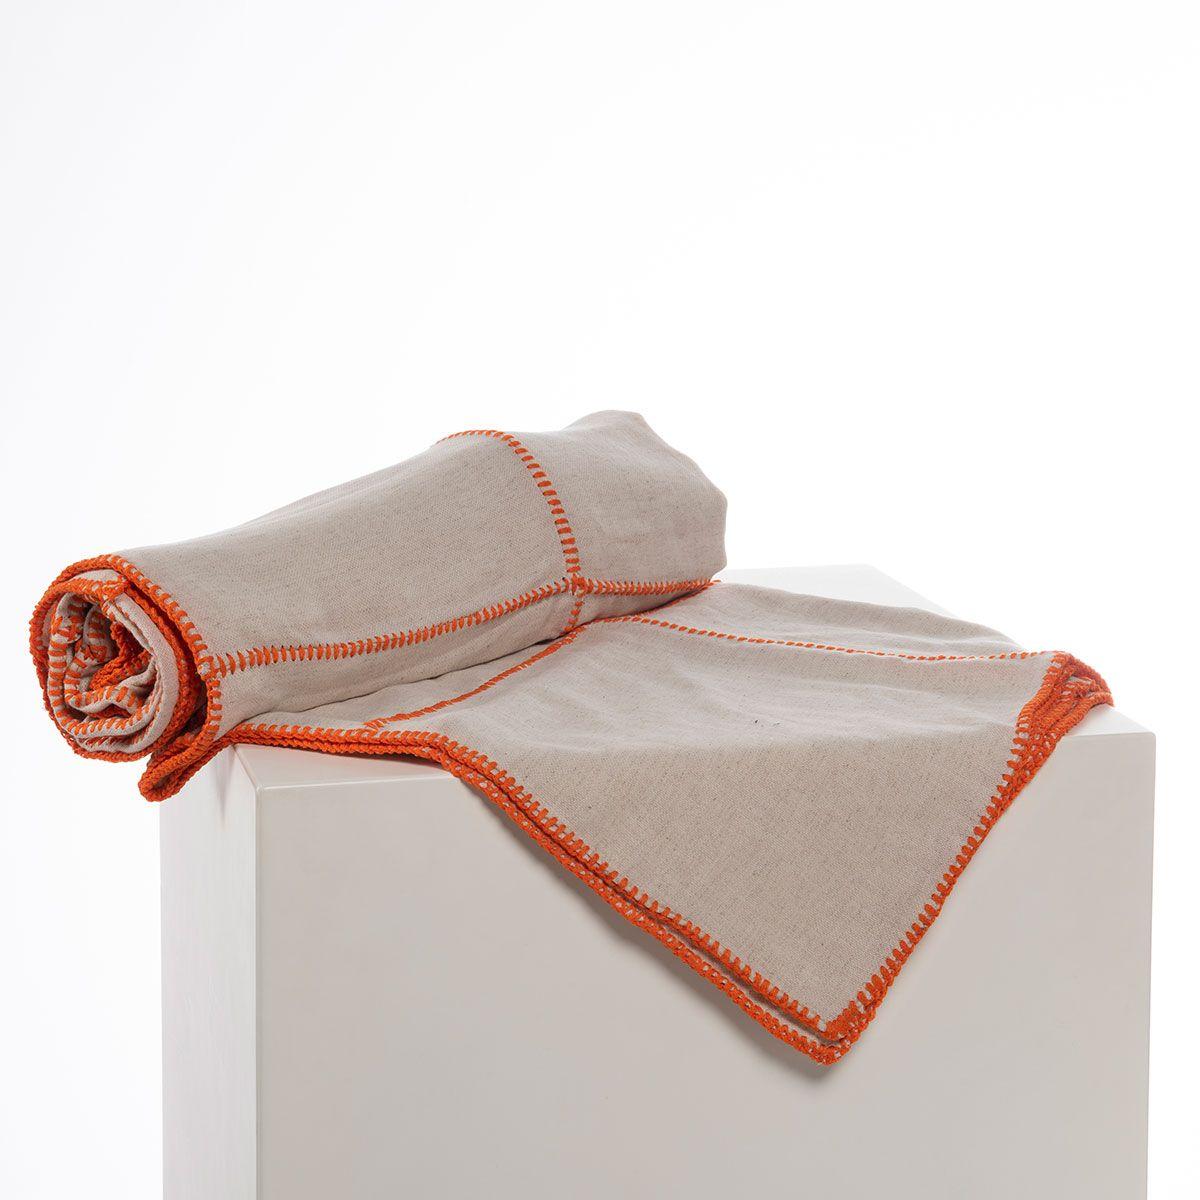 Throw - Nature / Orange stitched (Patchwork)